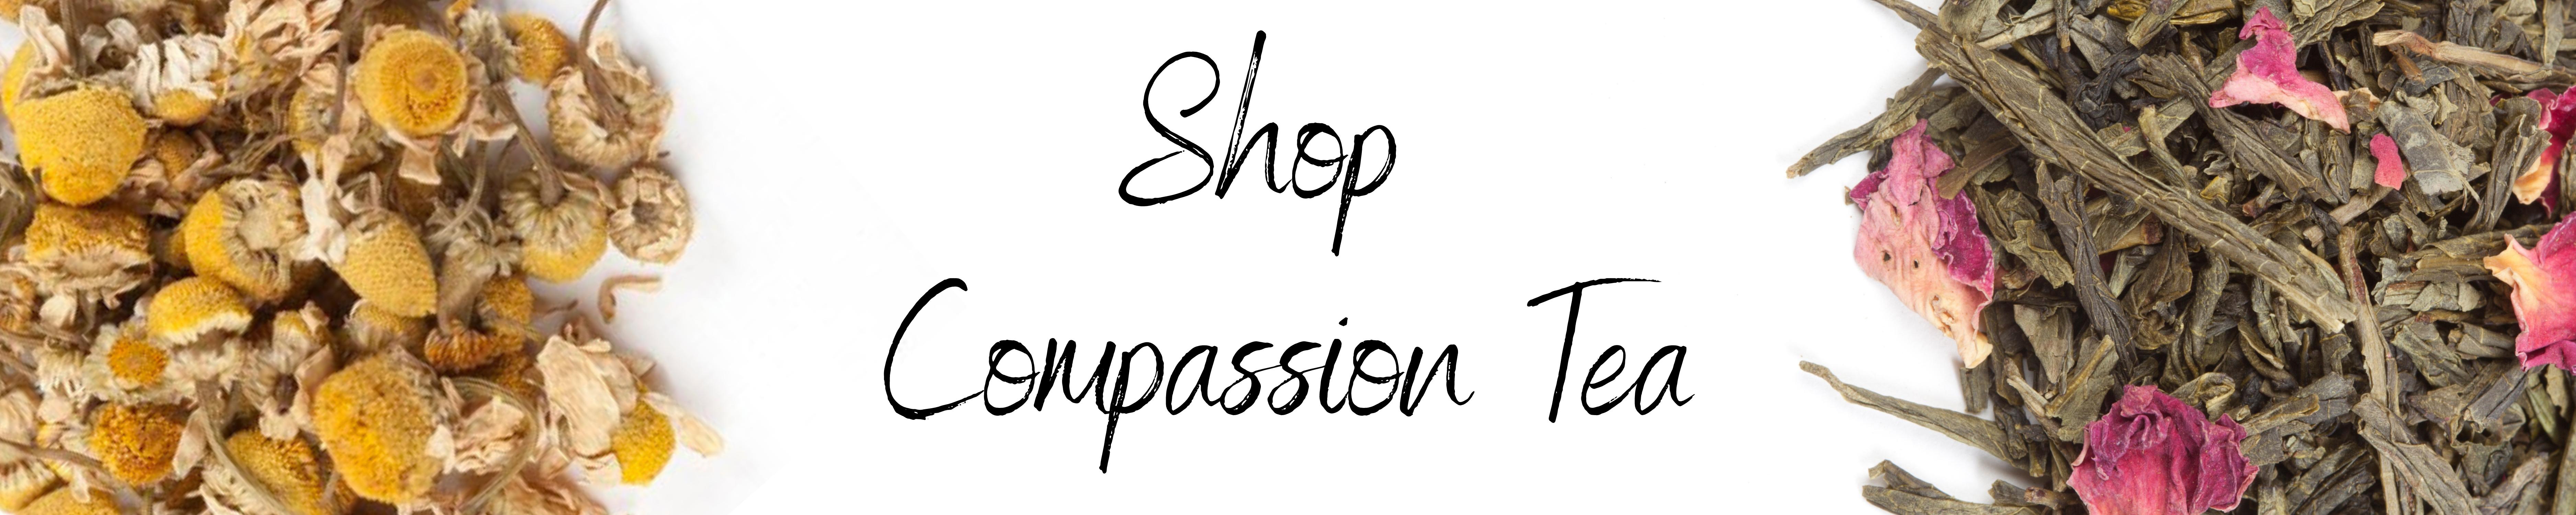 Shop Compassion Tea